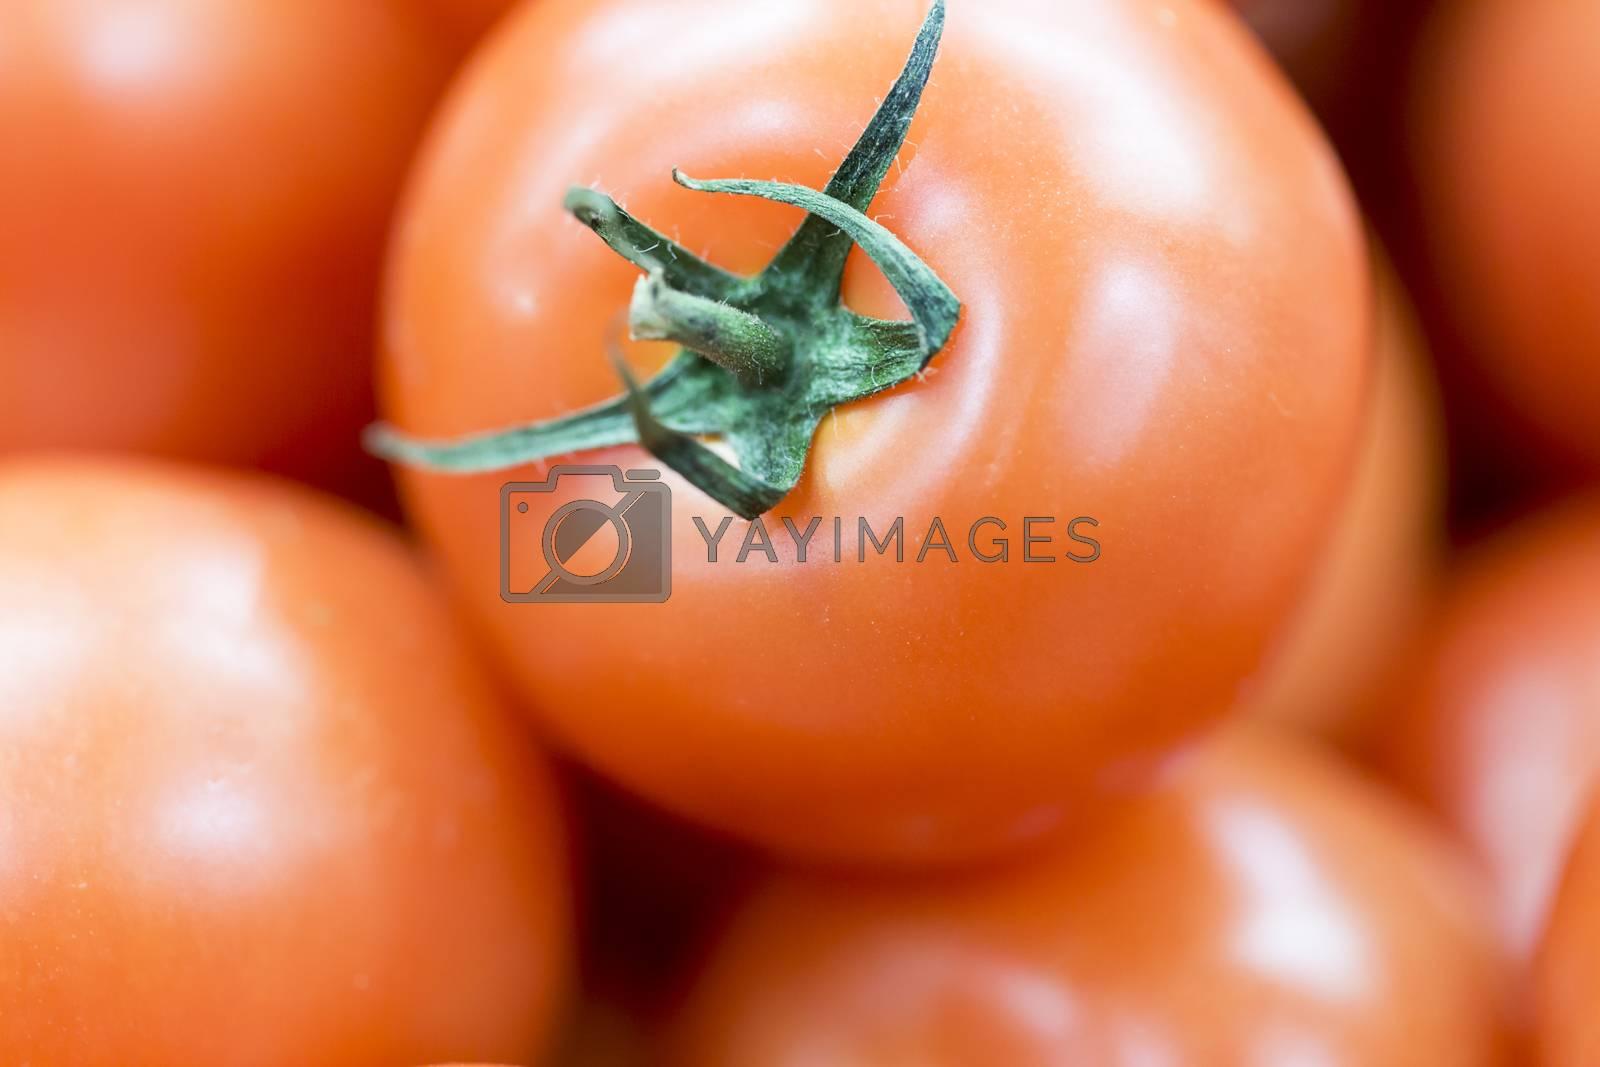 Tomato Close Up. Macro Image.